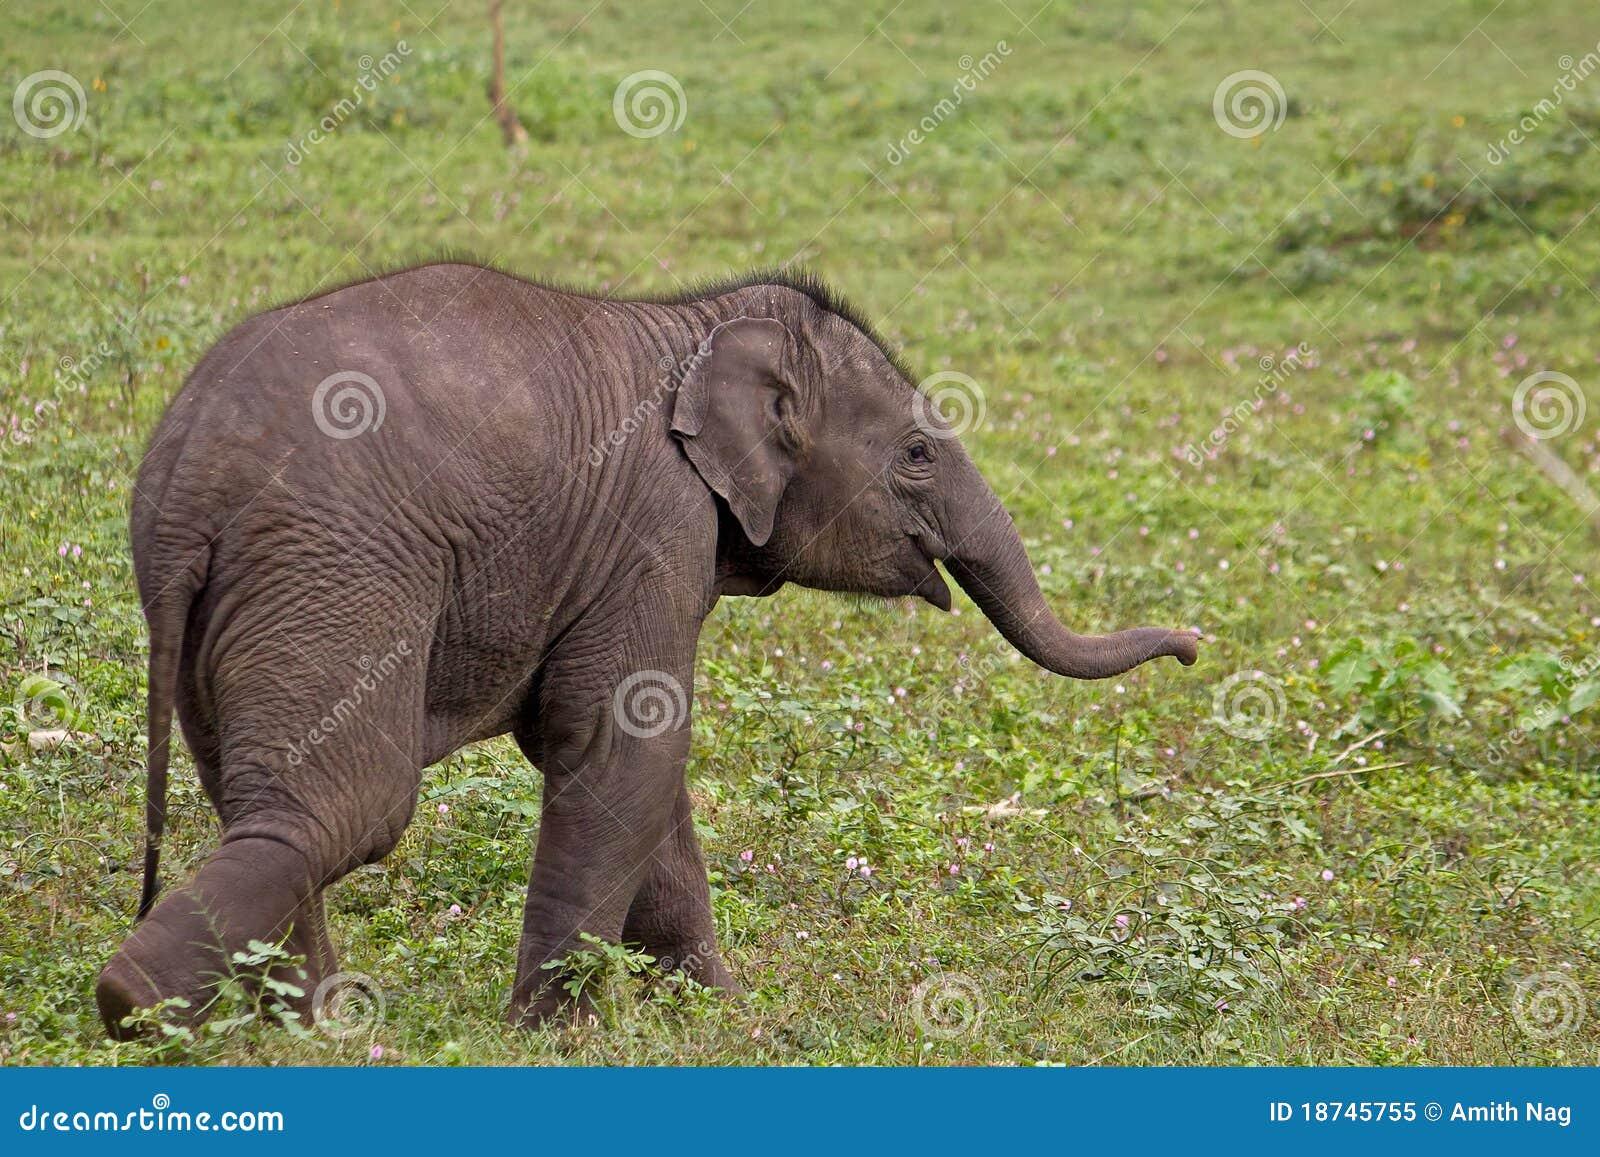 mischief stock image  image of india  550d  green  mammal